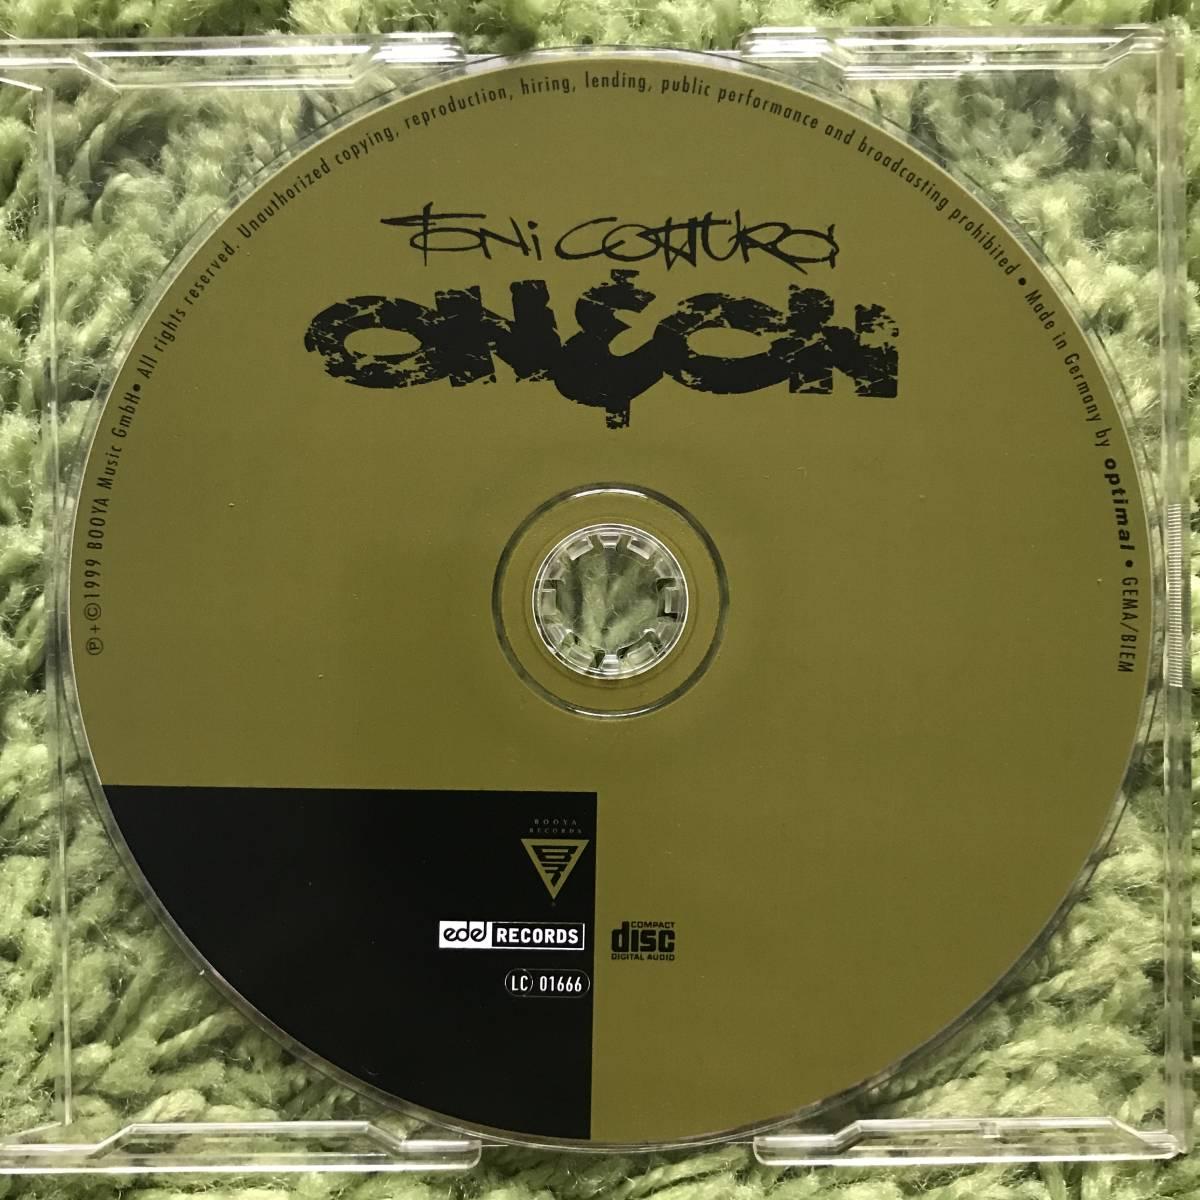 【CD Single】Toni Cottura/On&On Gema盤